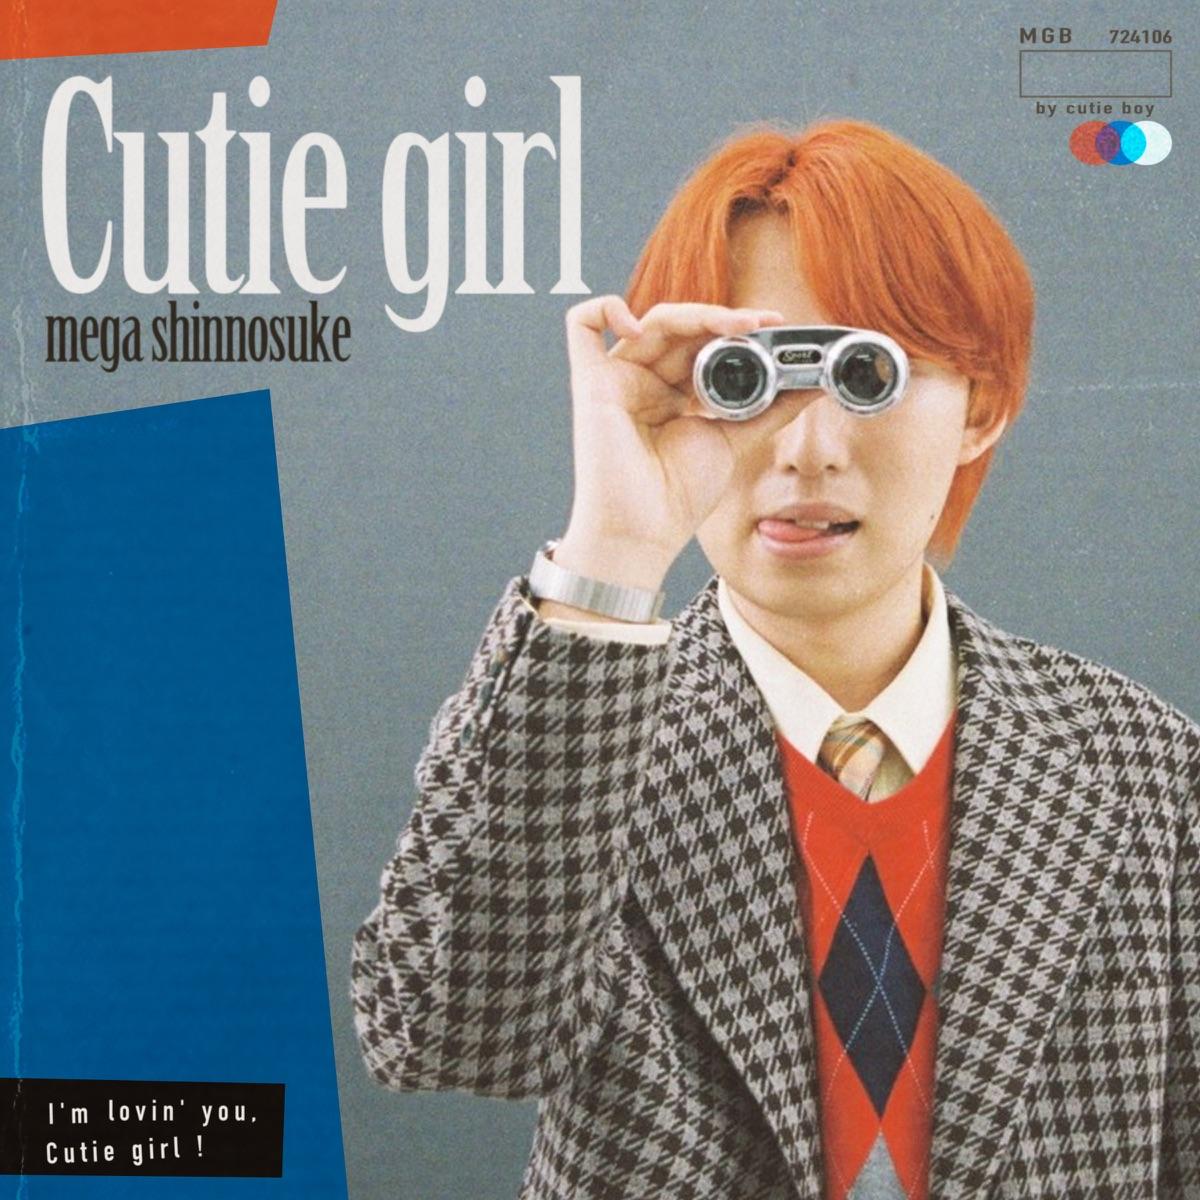 『Mega Shinnosuke - Cutie girl』収録の『Cutie girl』ジャケット